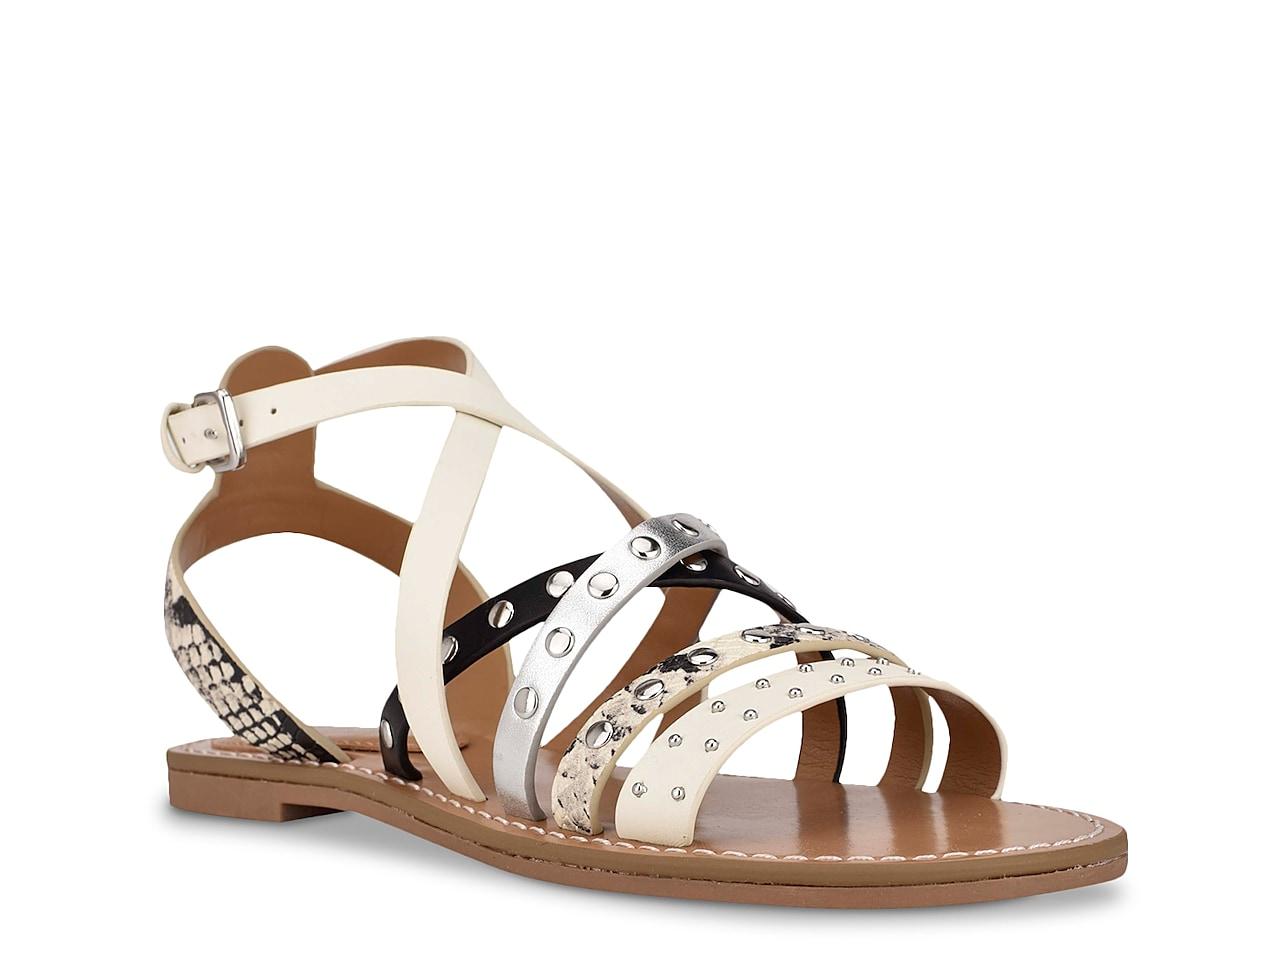 Nine West Cane 3 Sandal